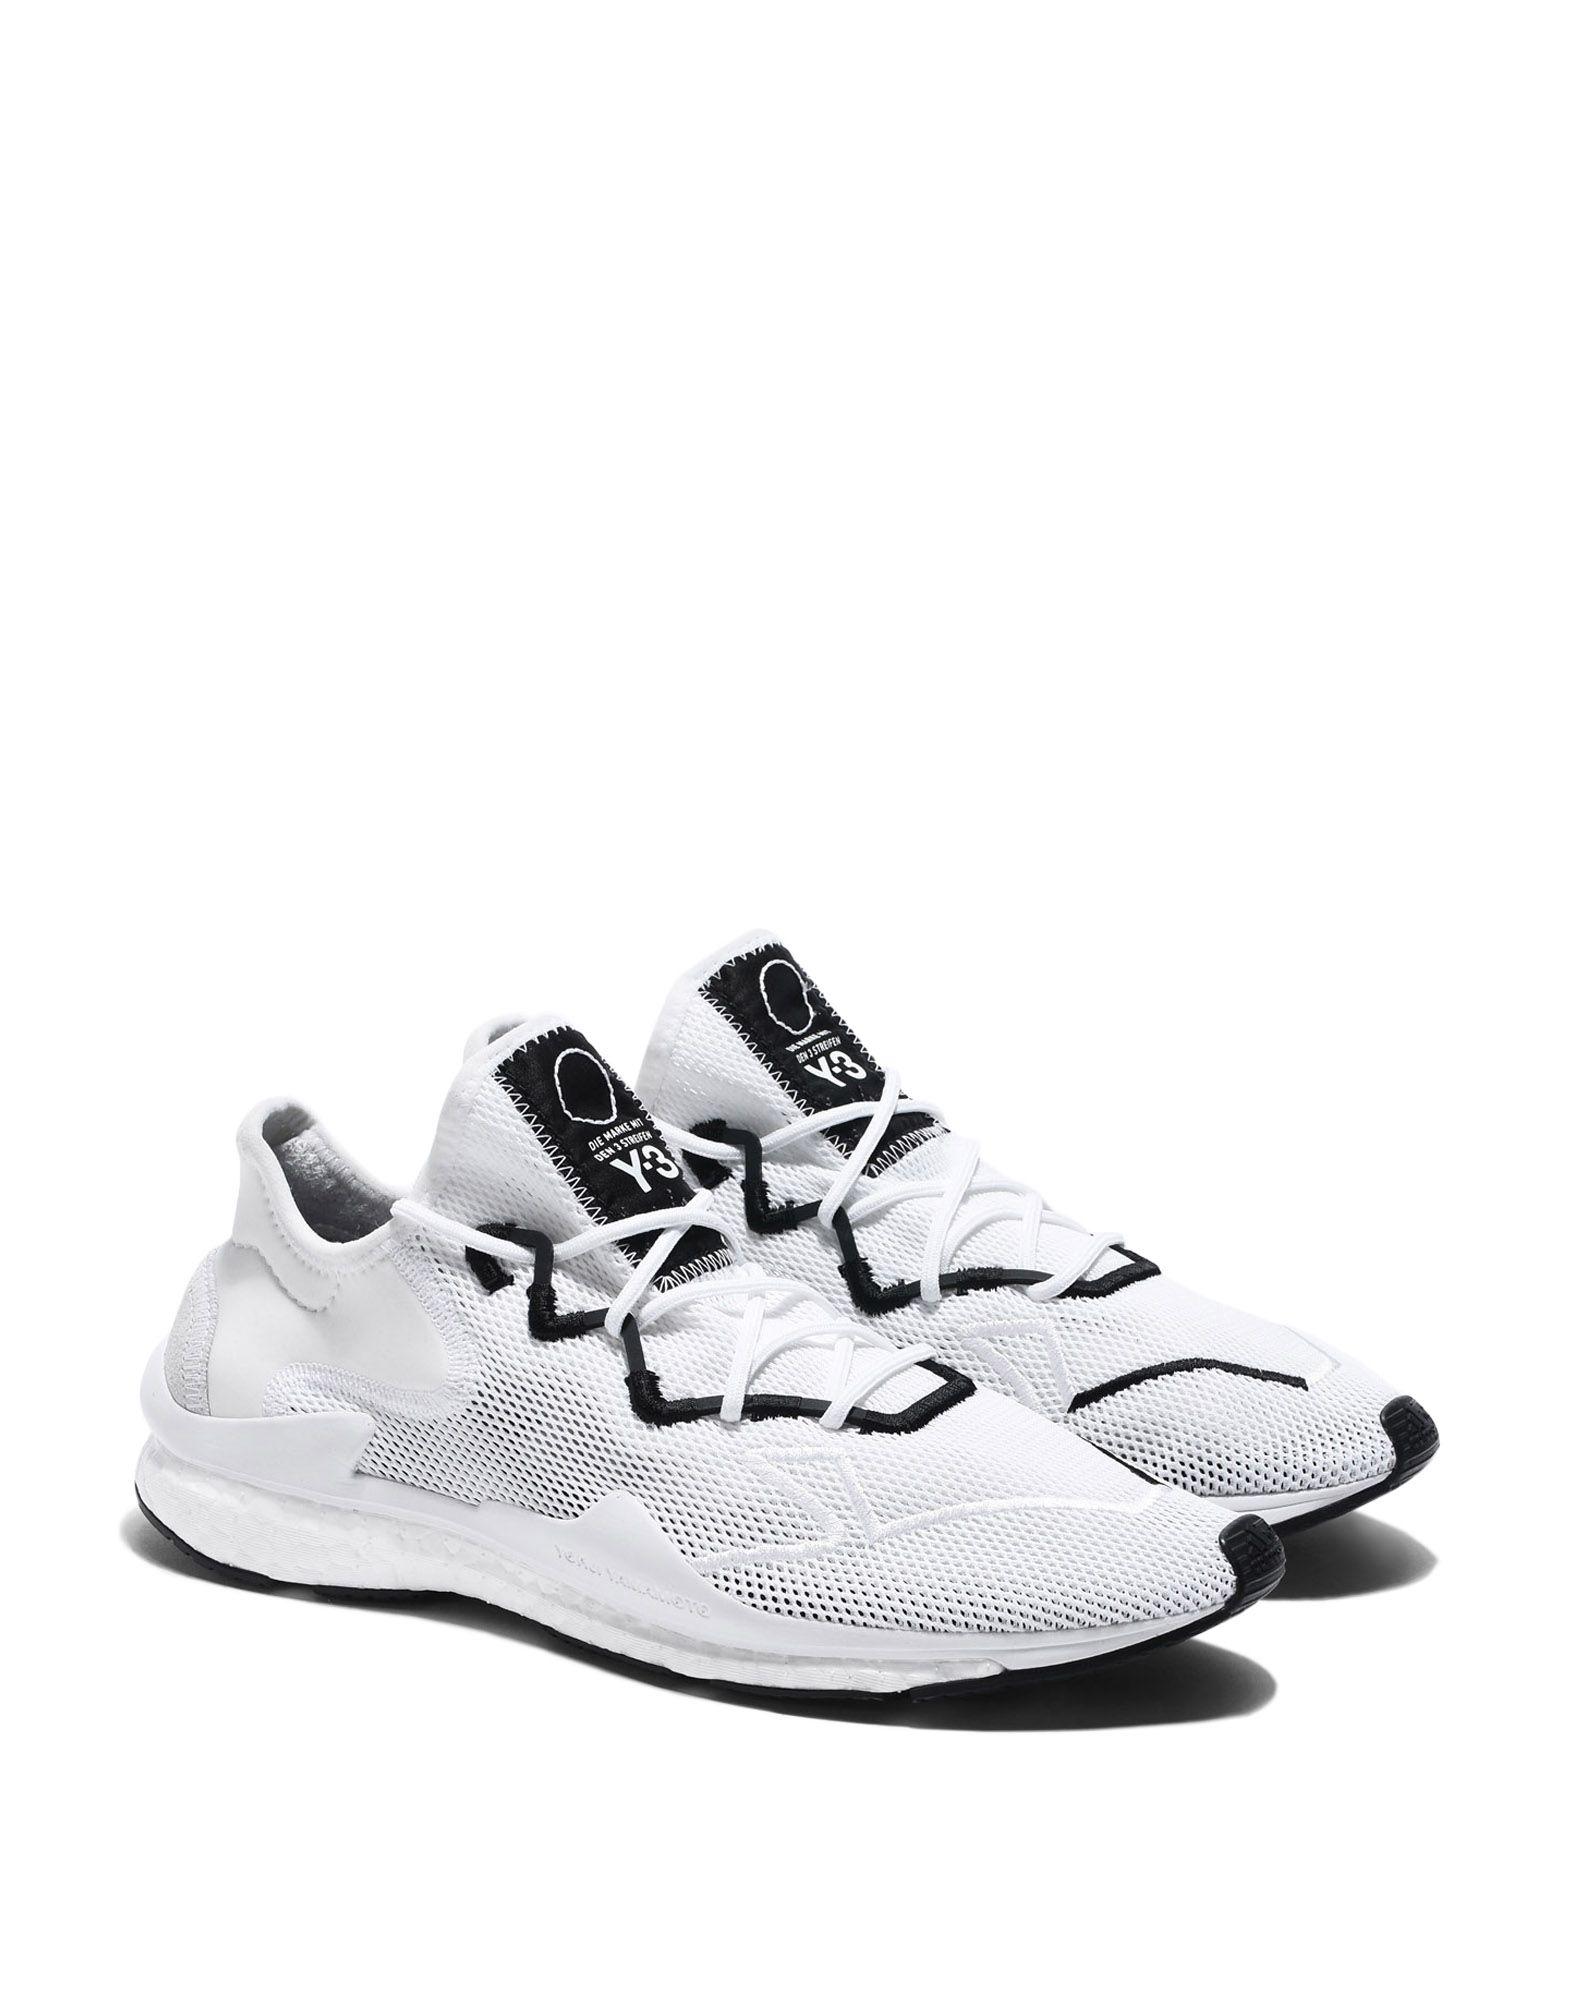 Y-3 Adizero Runner SHOES unisex Y-3 adidas